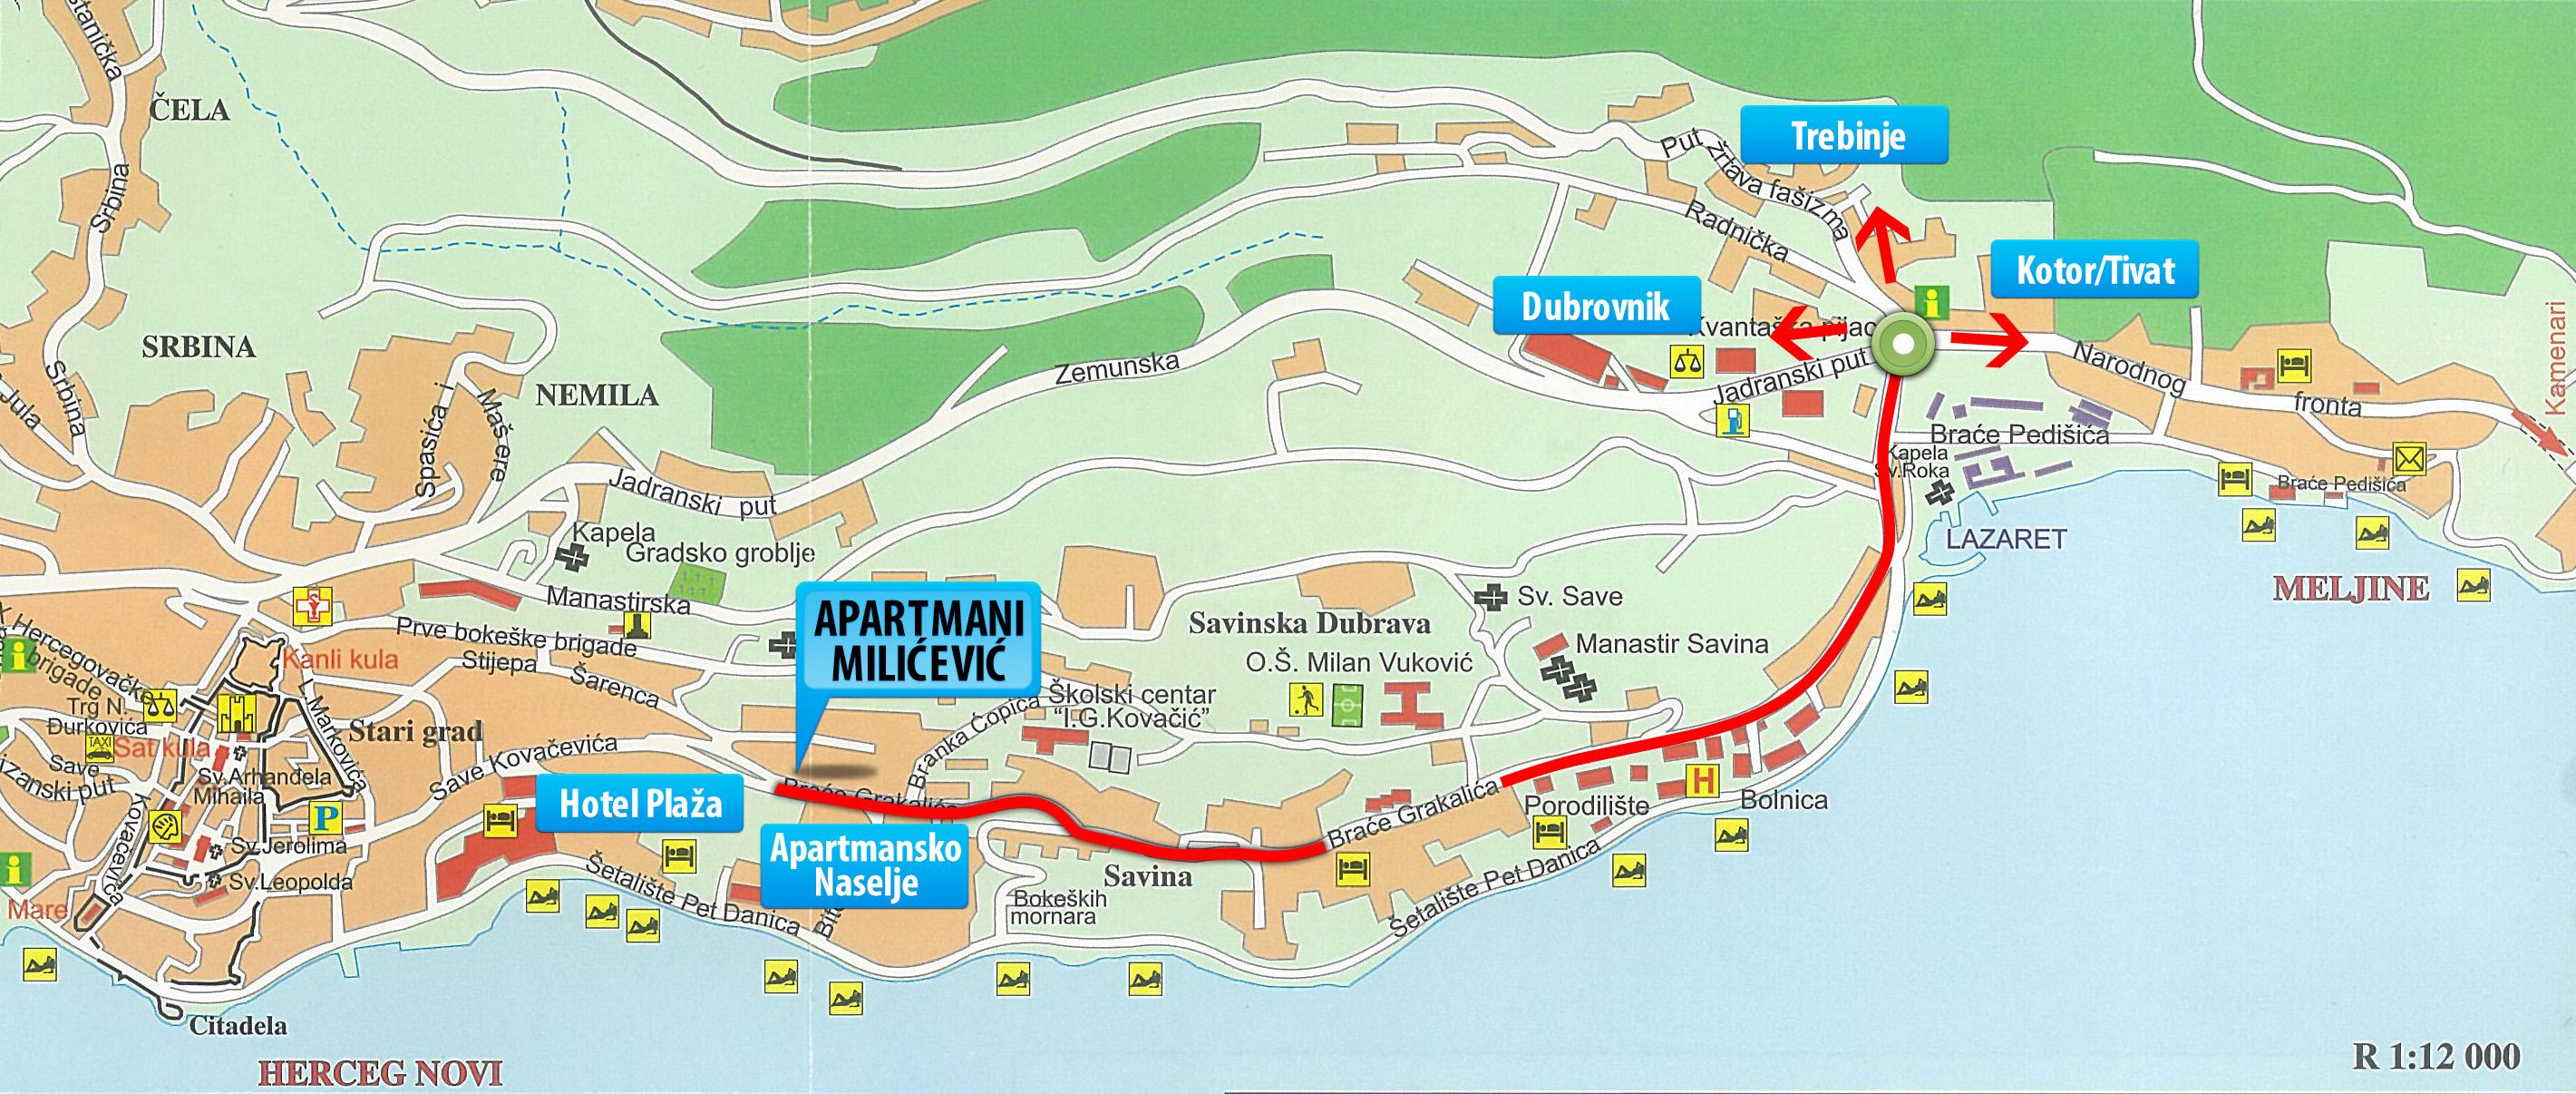 herceg novi mapa APARTMENTS MILICEVIC * * * HERCEG NOVI   HOLIDAY IN MONTENEGRO herceg novi mapa